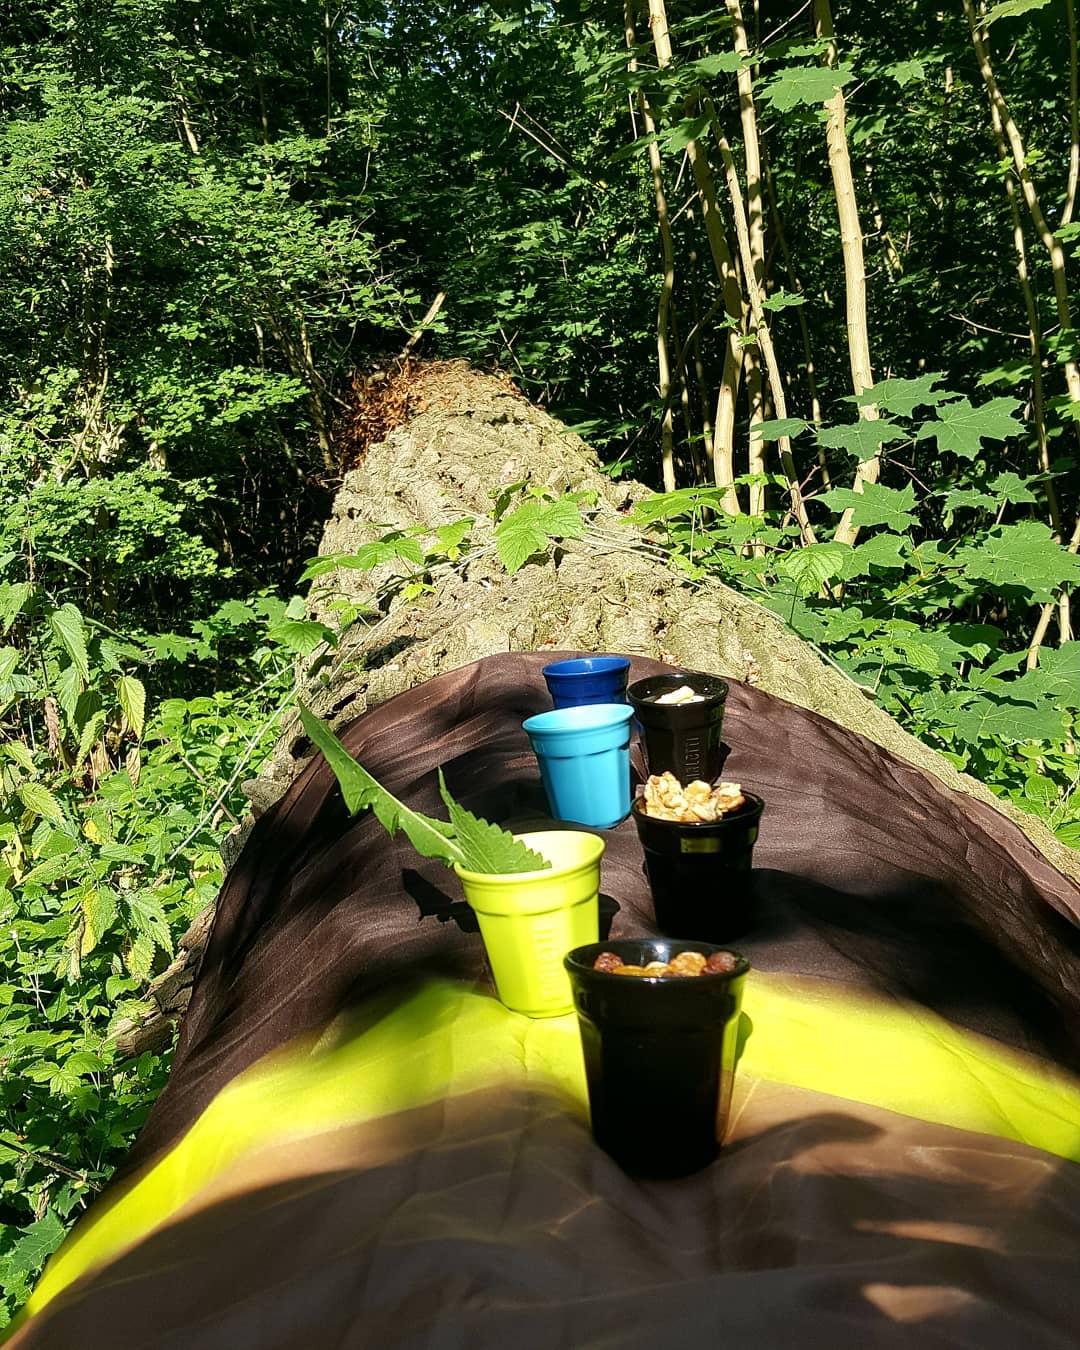 Shinrin-yoku Tea ceremony